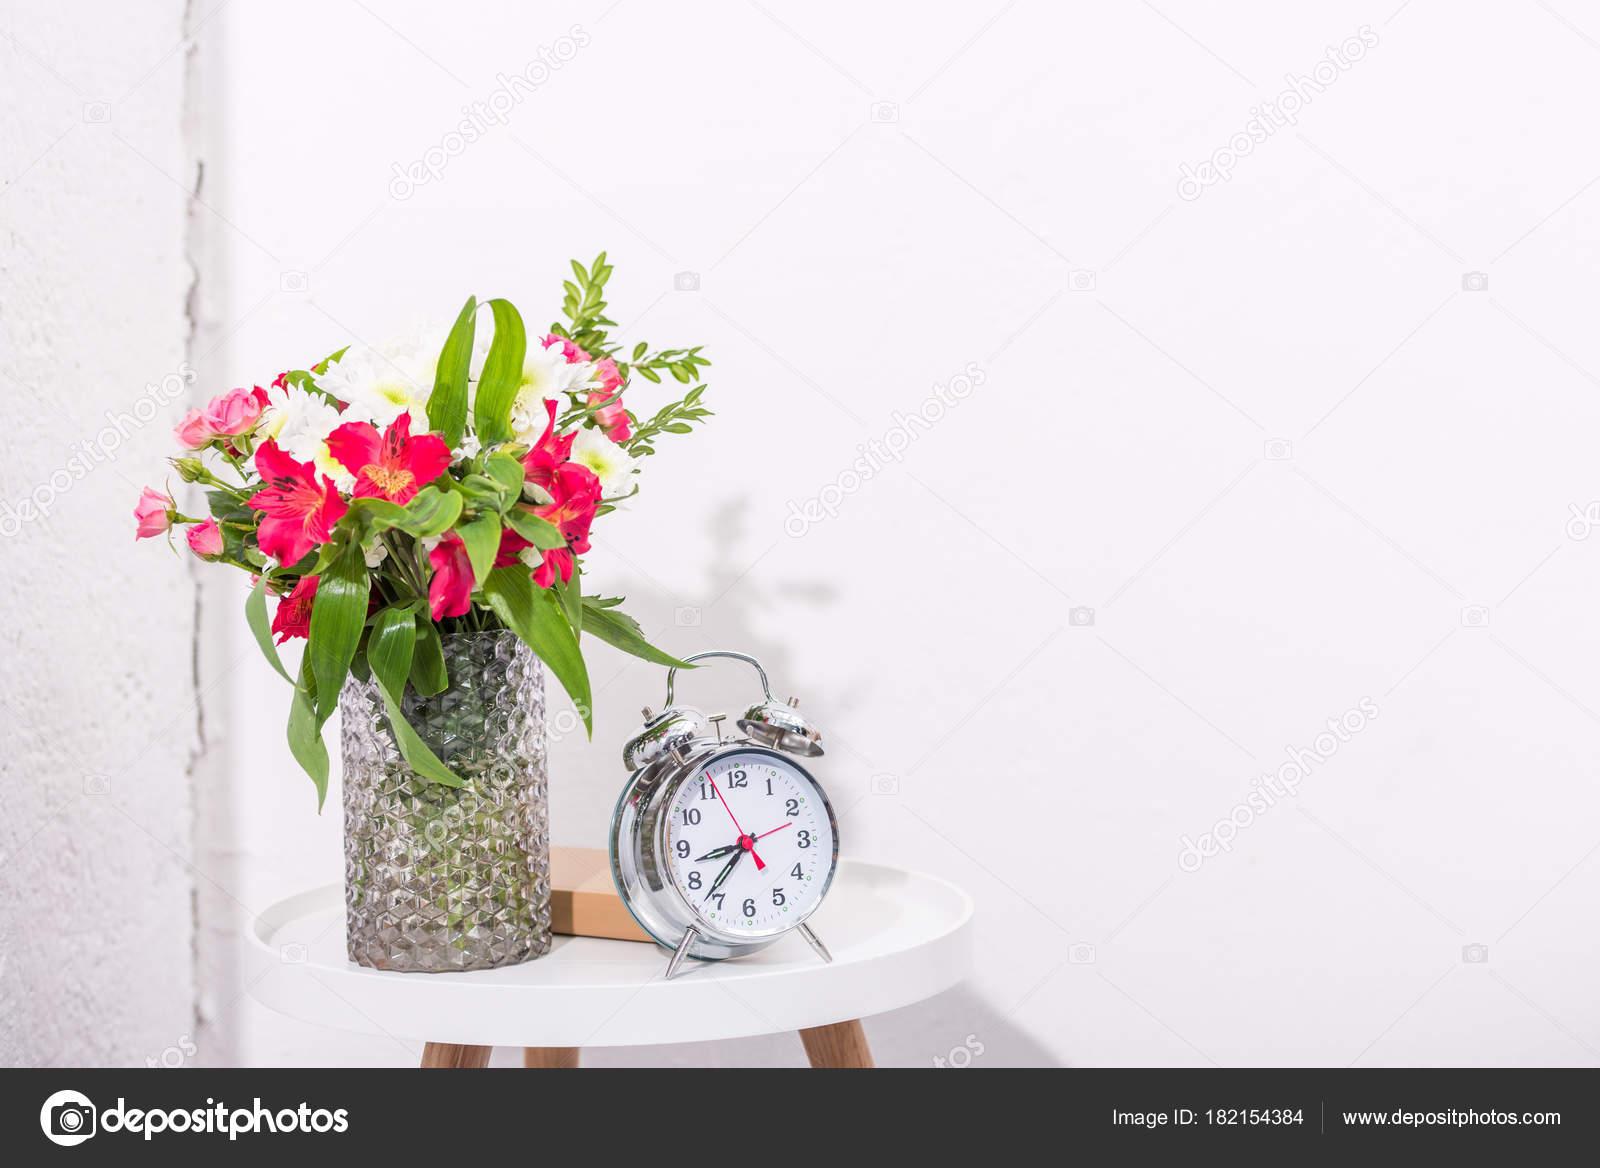 Vintage alarm clock table flowers vase stock photo vintage alarm clock table flowers vase stock photo reviewsmspy